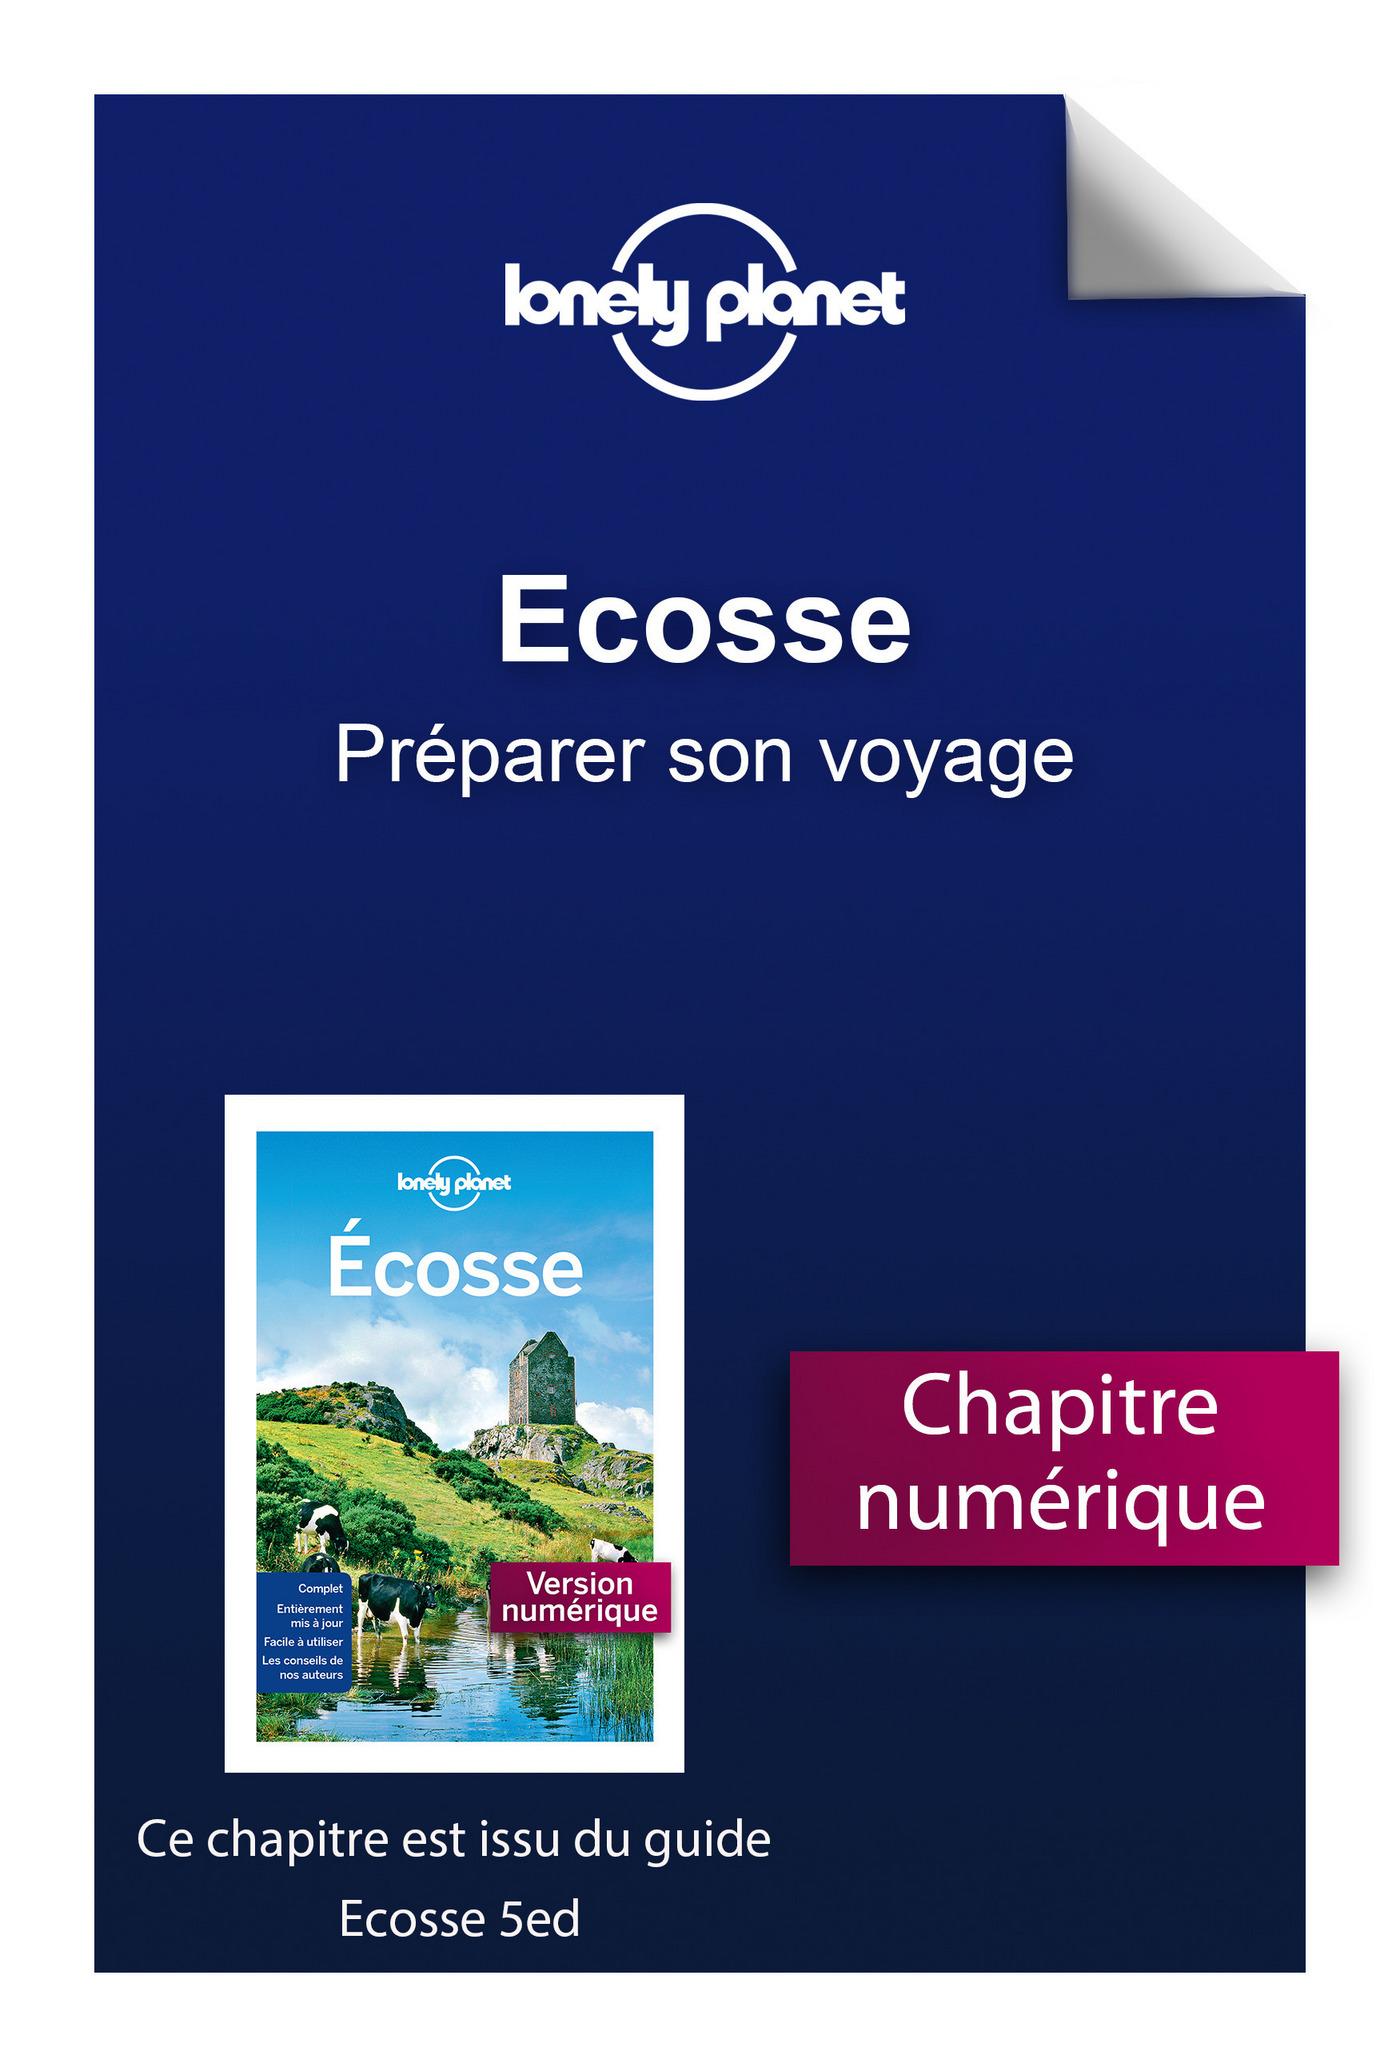 Ecosse 5 - Préparer son voyage